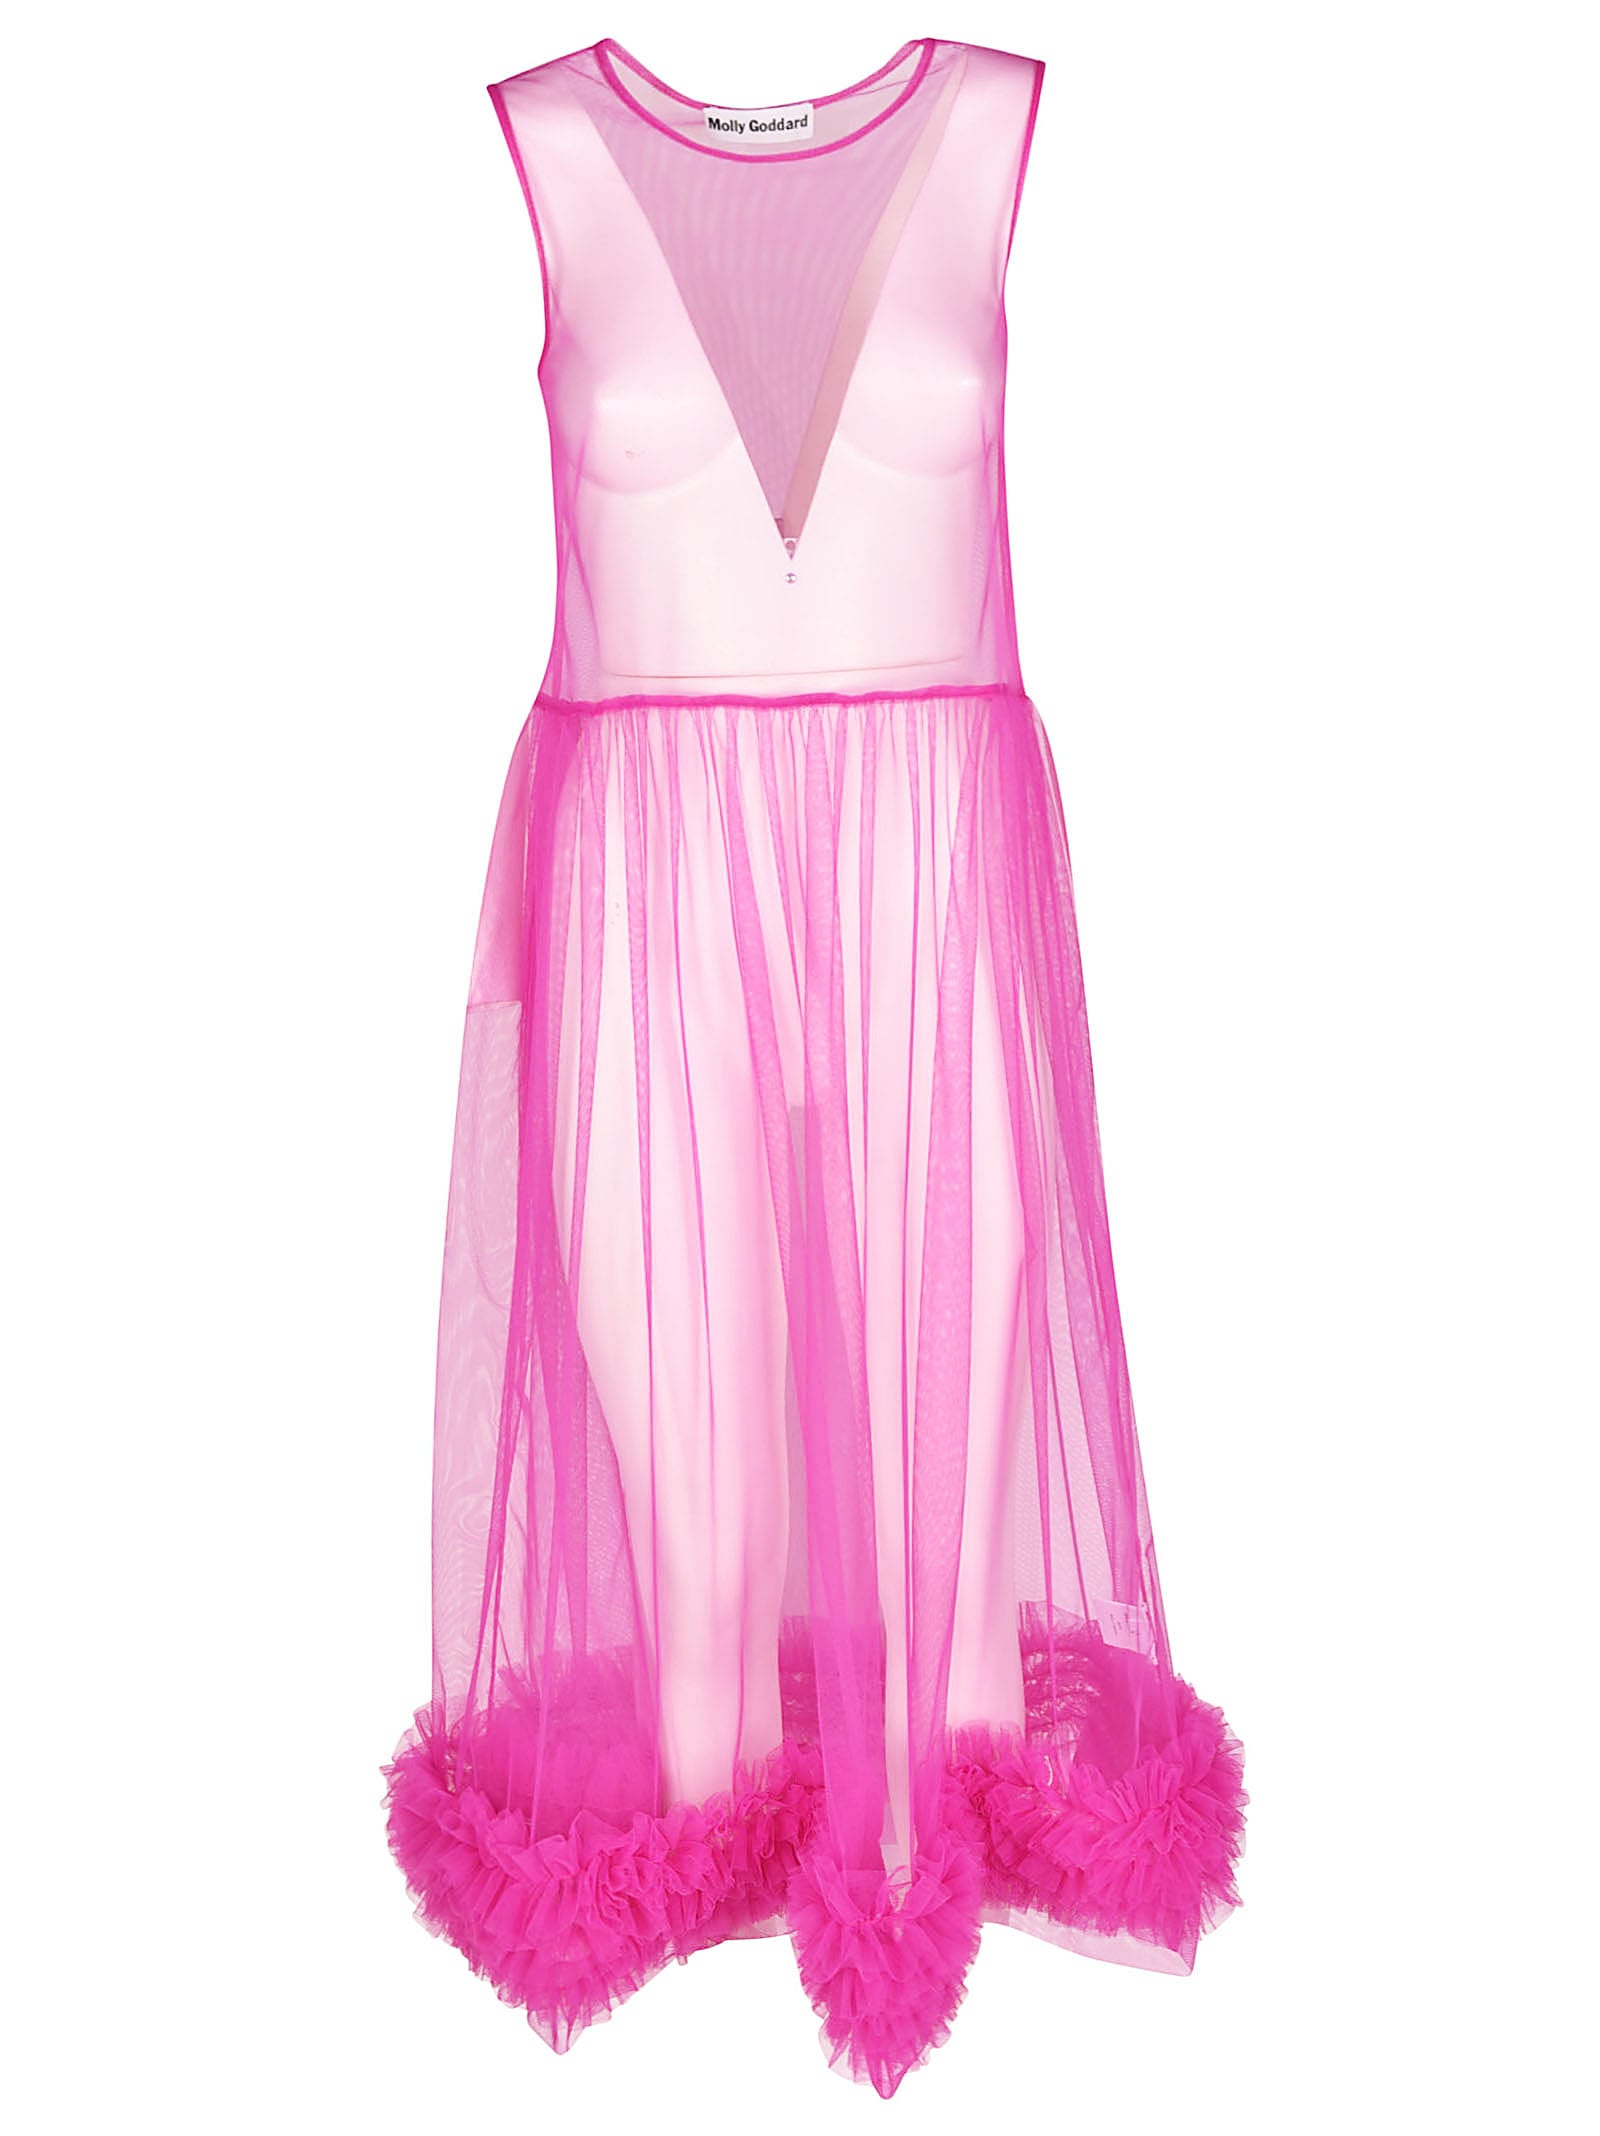 Molly Goddard Transparent Dress